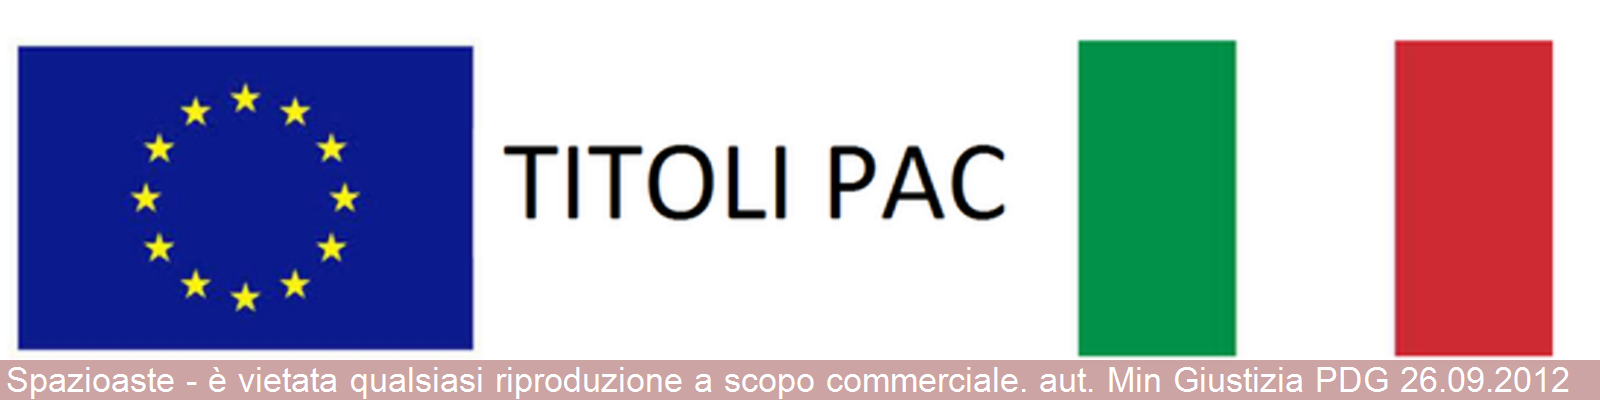 N. 52 TITOLI PAC LOTTO N. 9